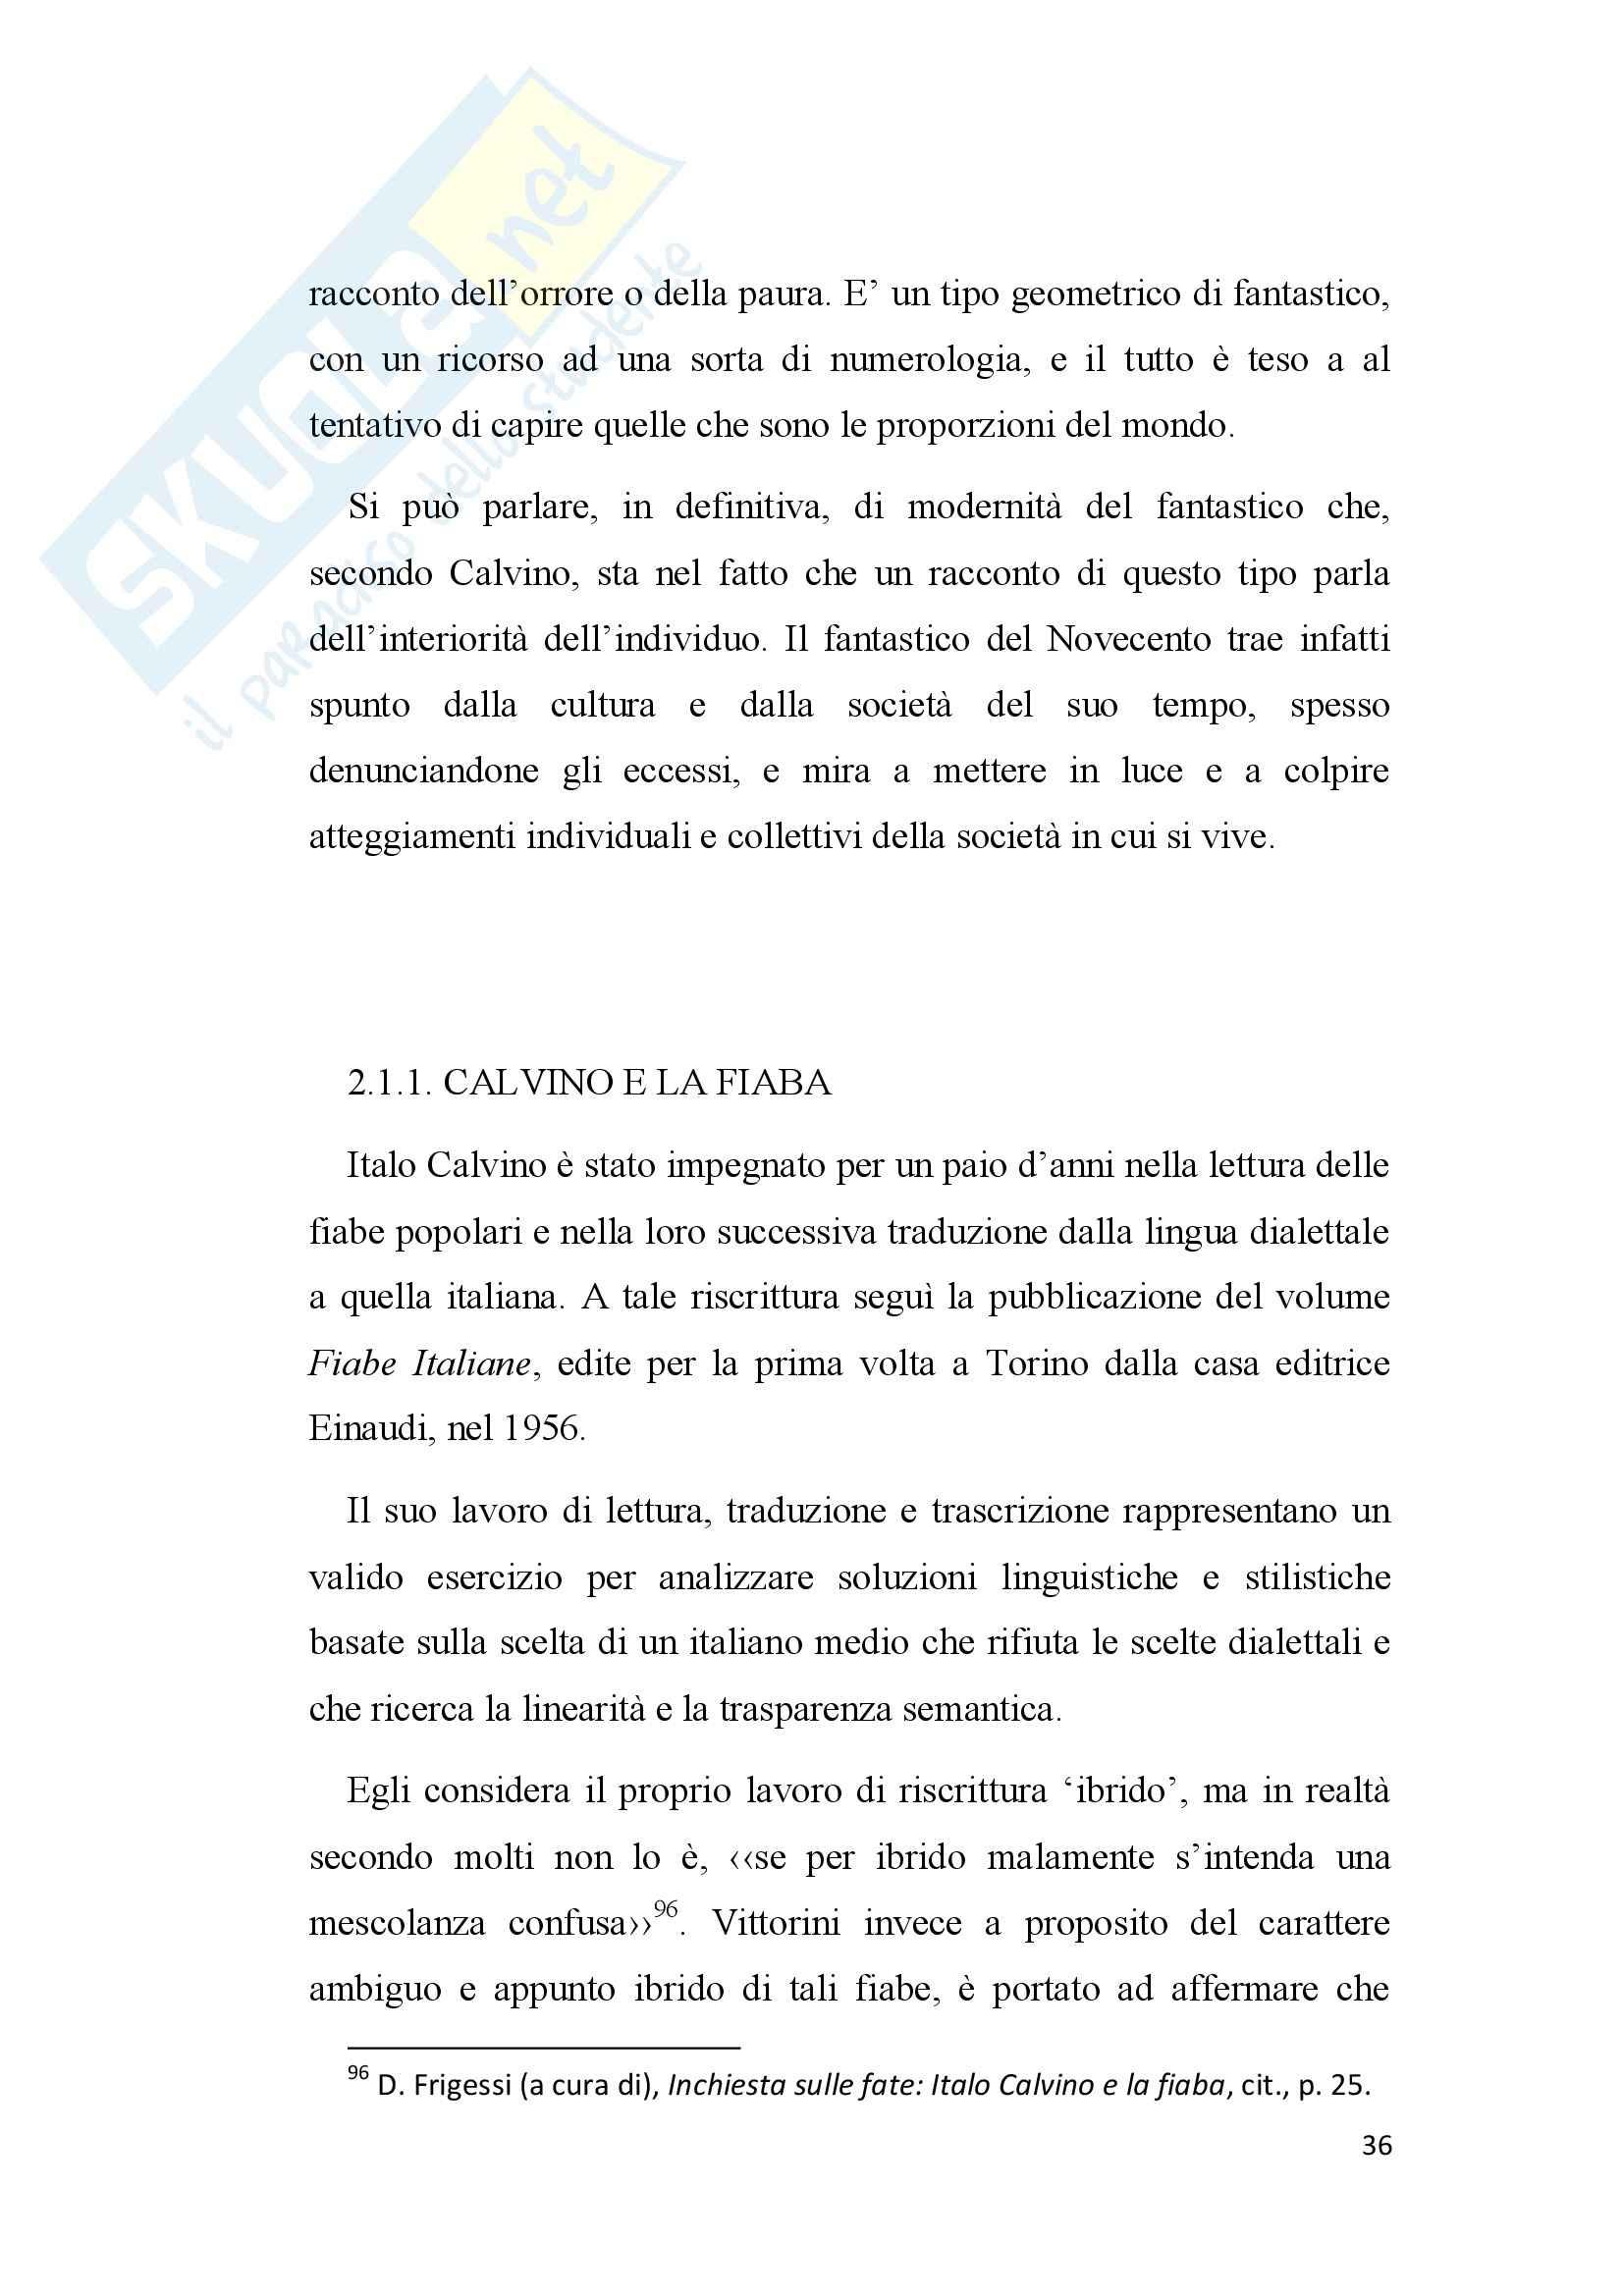 Tesi - Italo Calvino e il fantastico Pag. 36